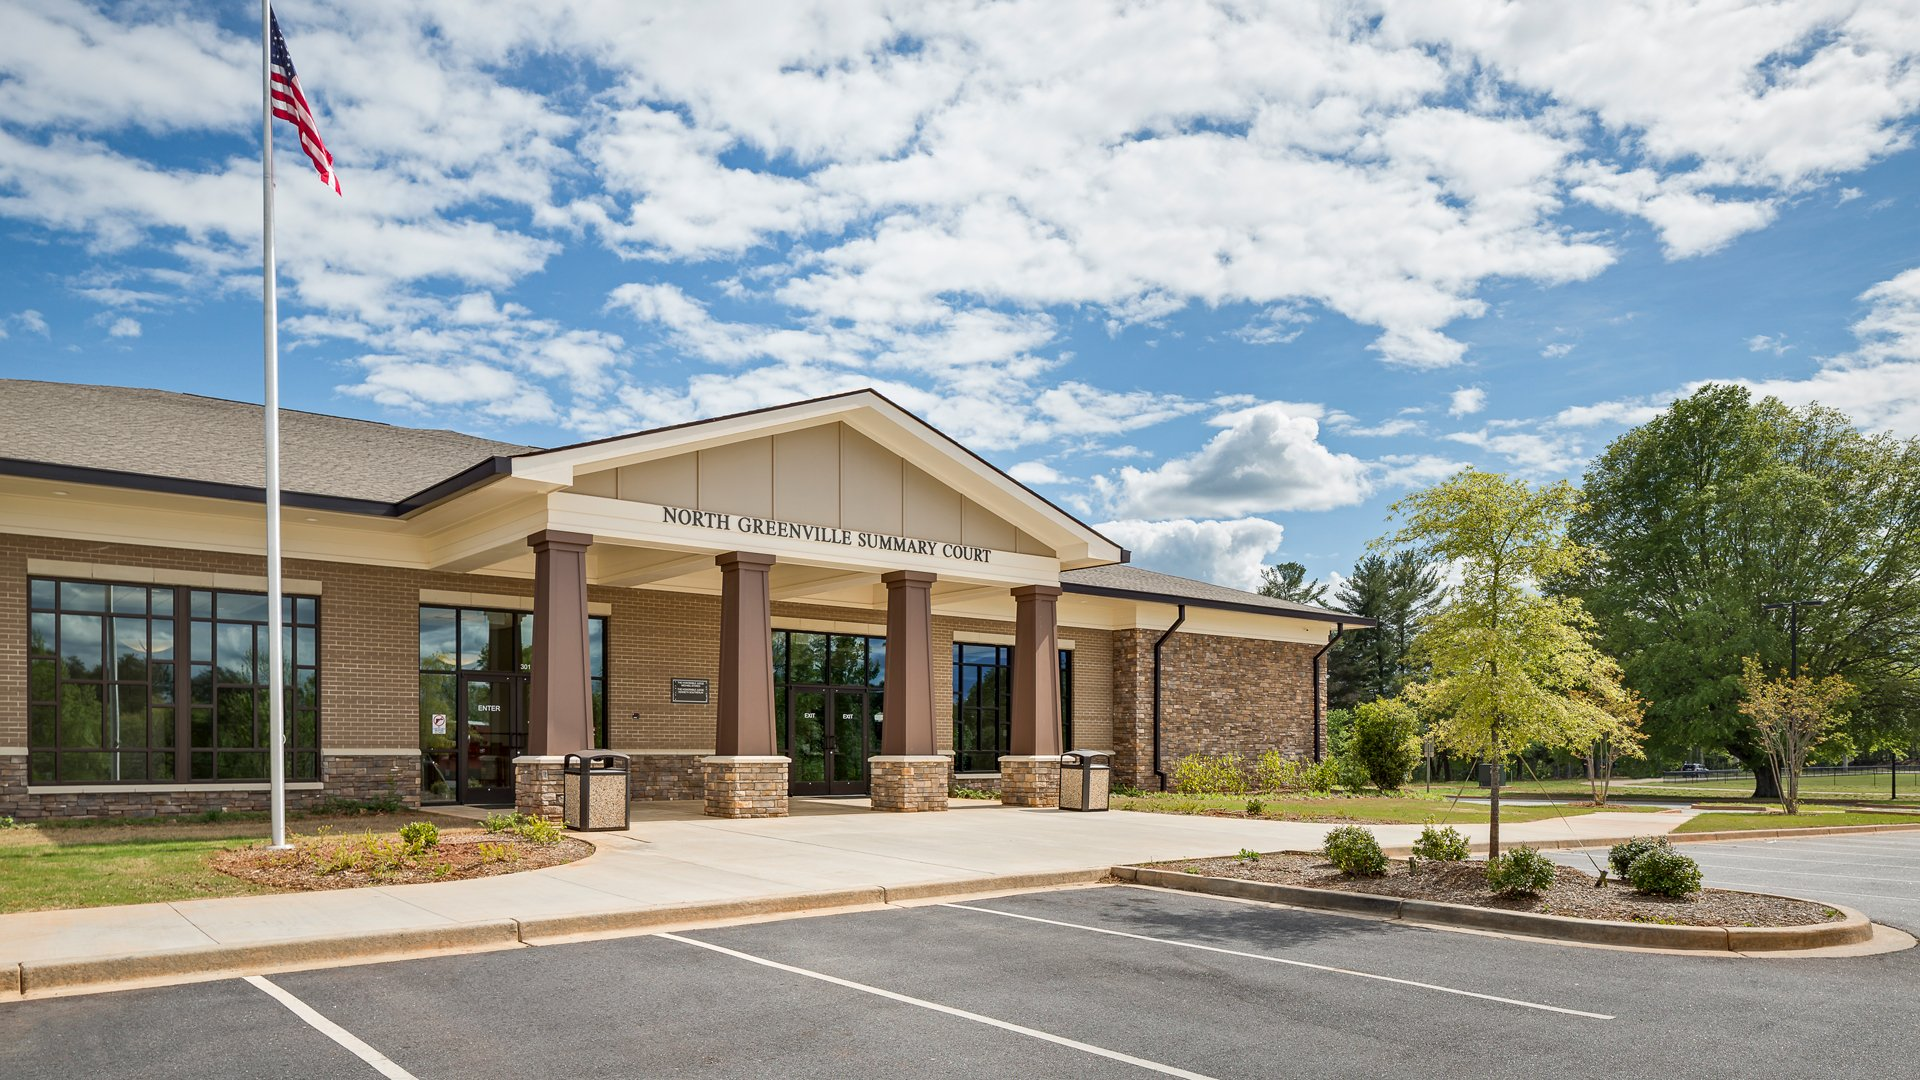 North Greenville Summary Court, Travelers Rest